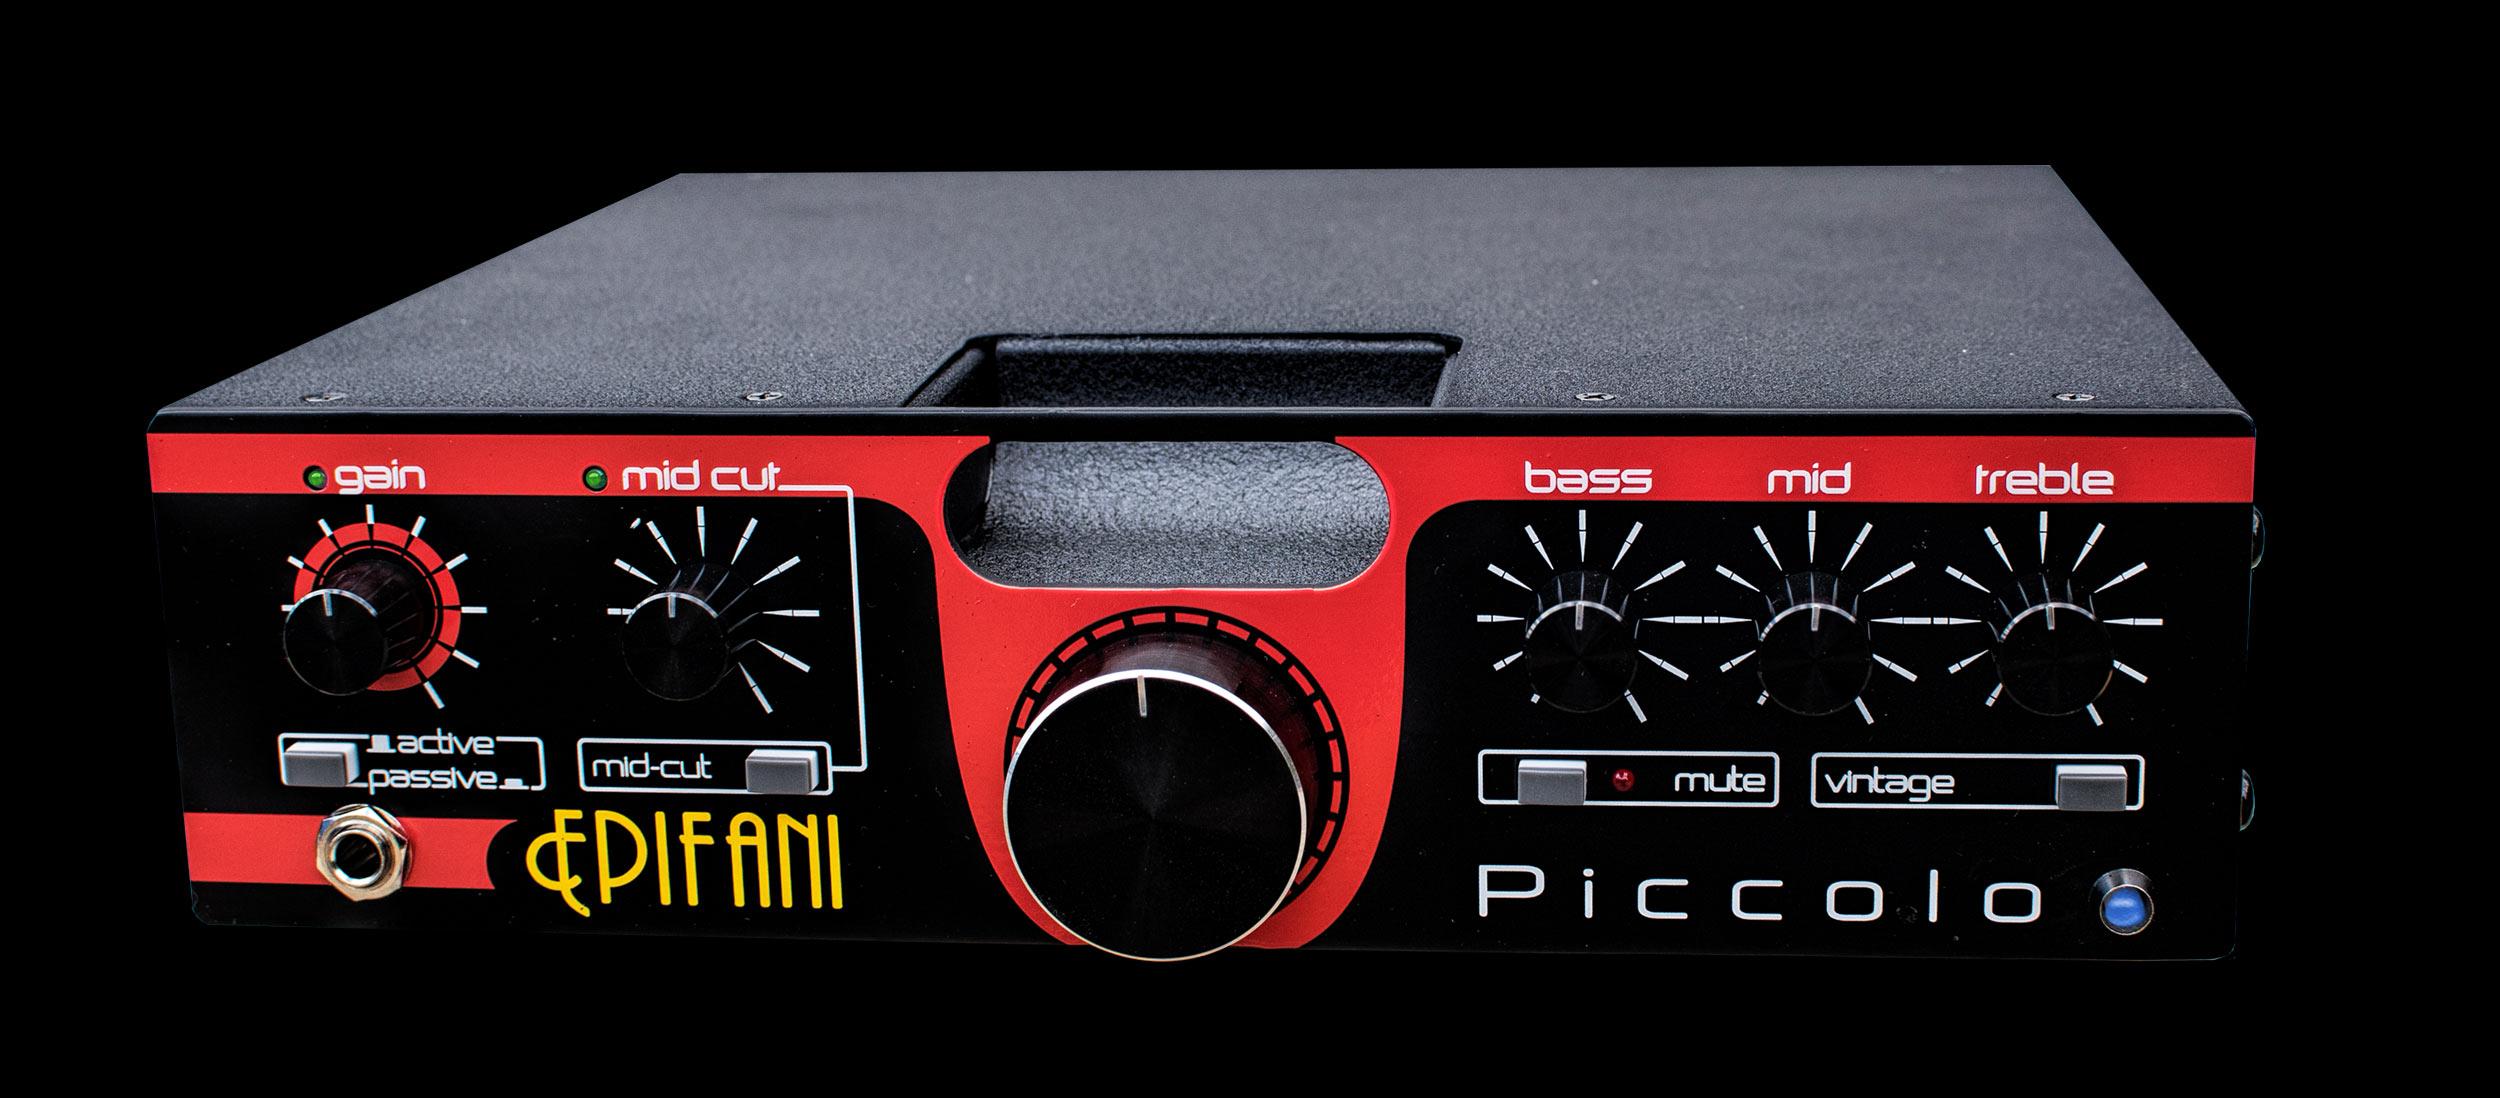 epifani-piccolo-bass-amp-right.jpg